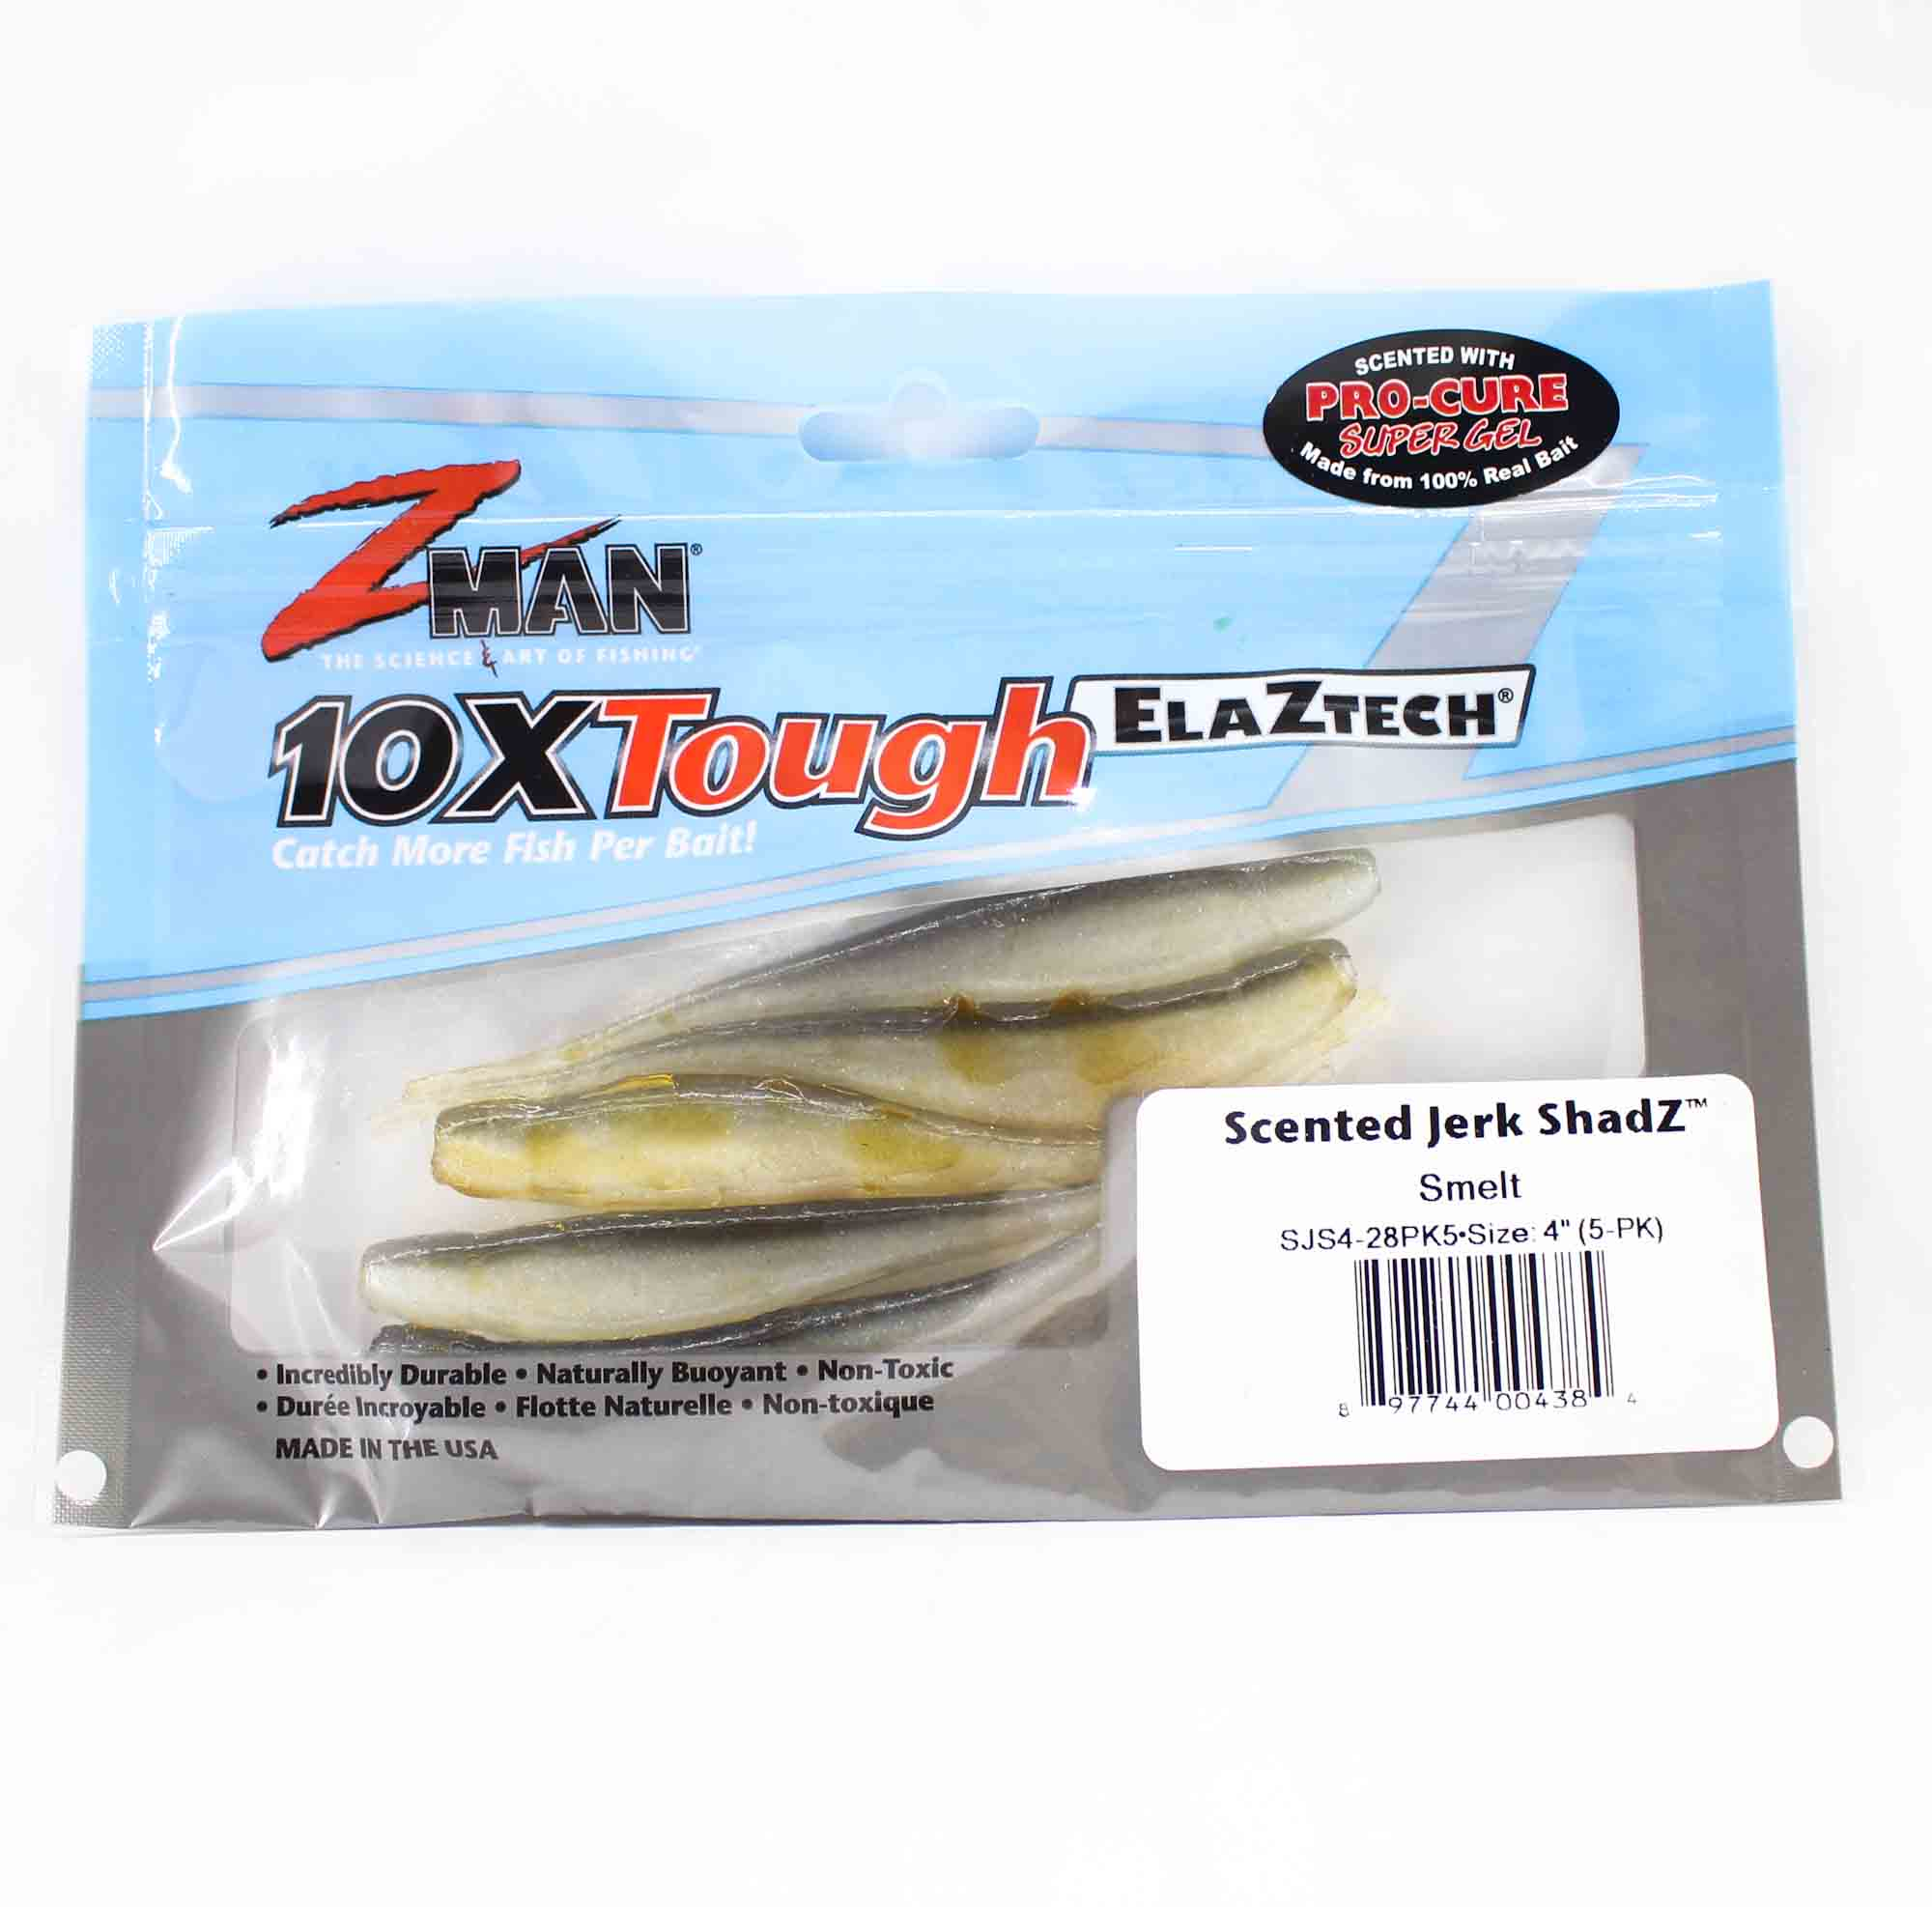 Zman Soft Lure Jerk ShadZ 4 Inch 5 per pack Smelt (4384)